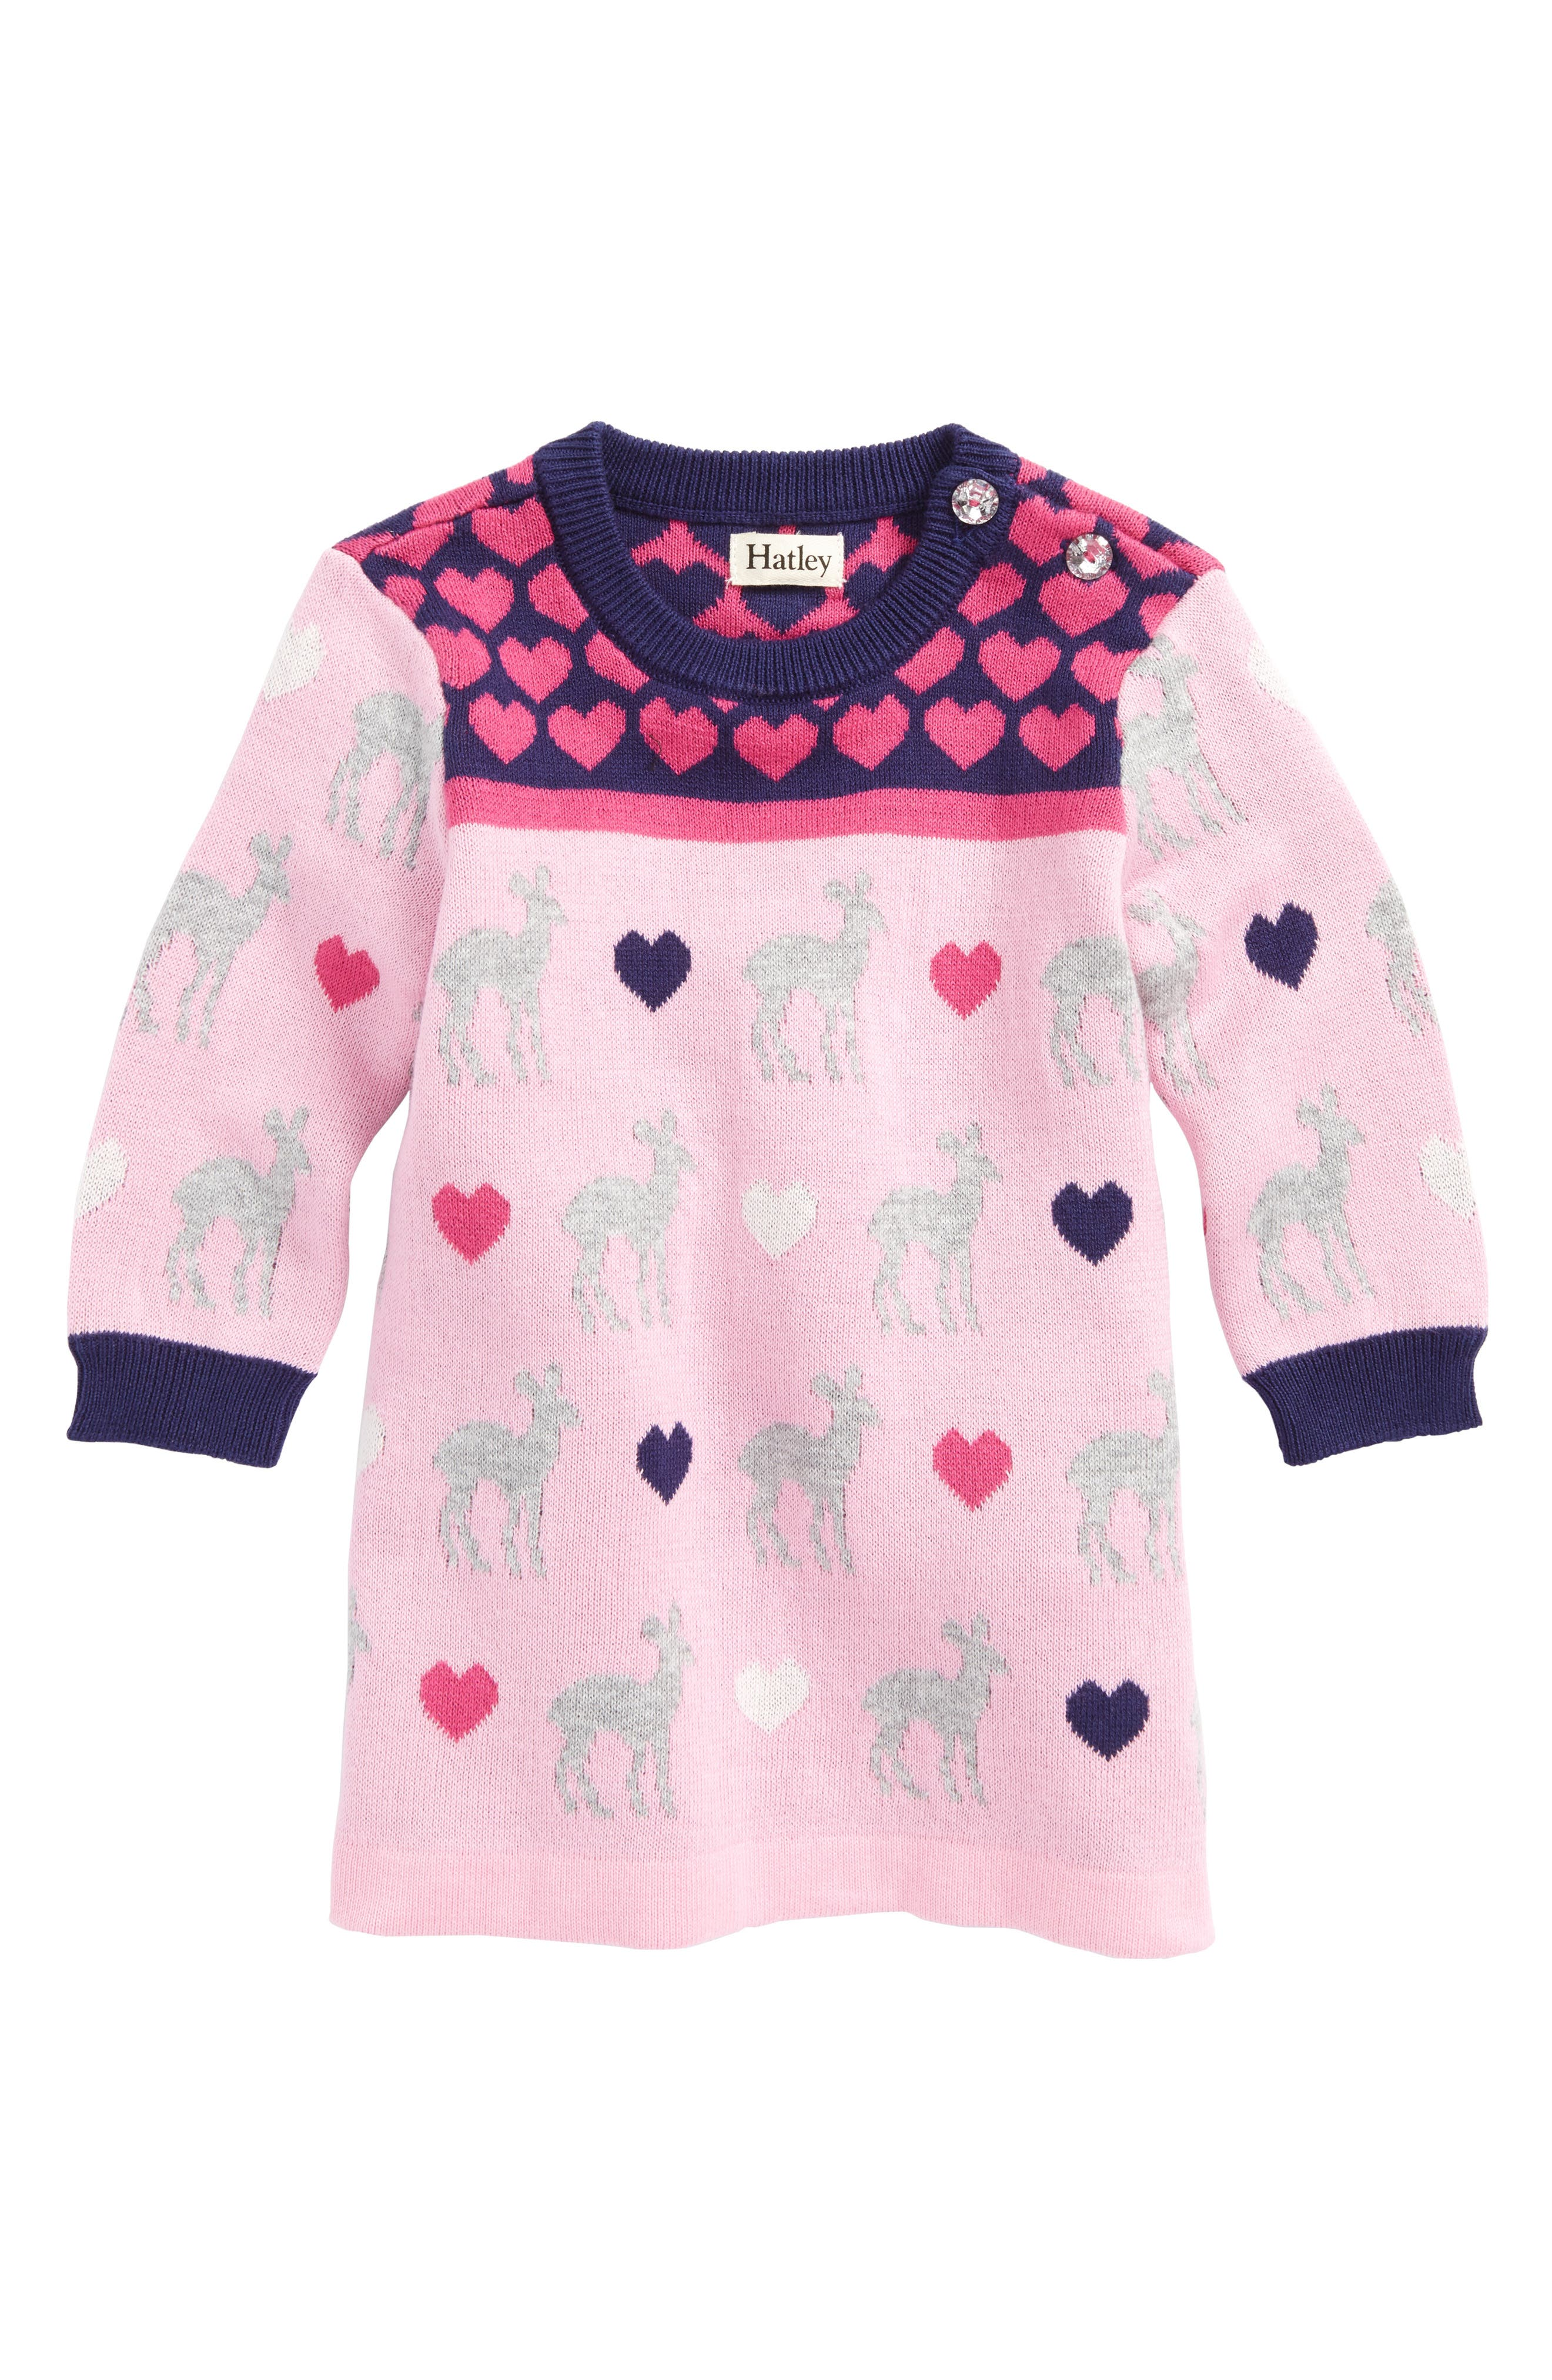 Hatley Sweater Dress (Baby Girls)